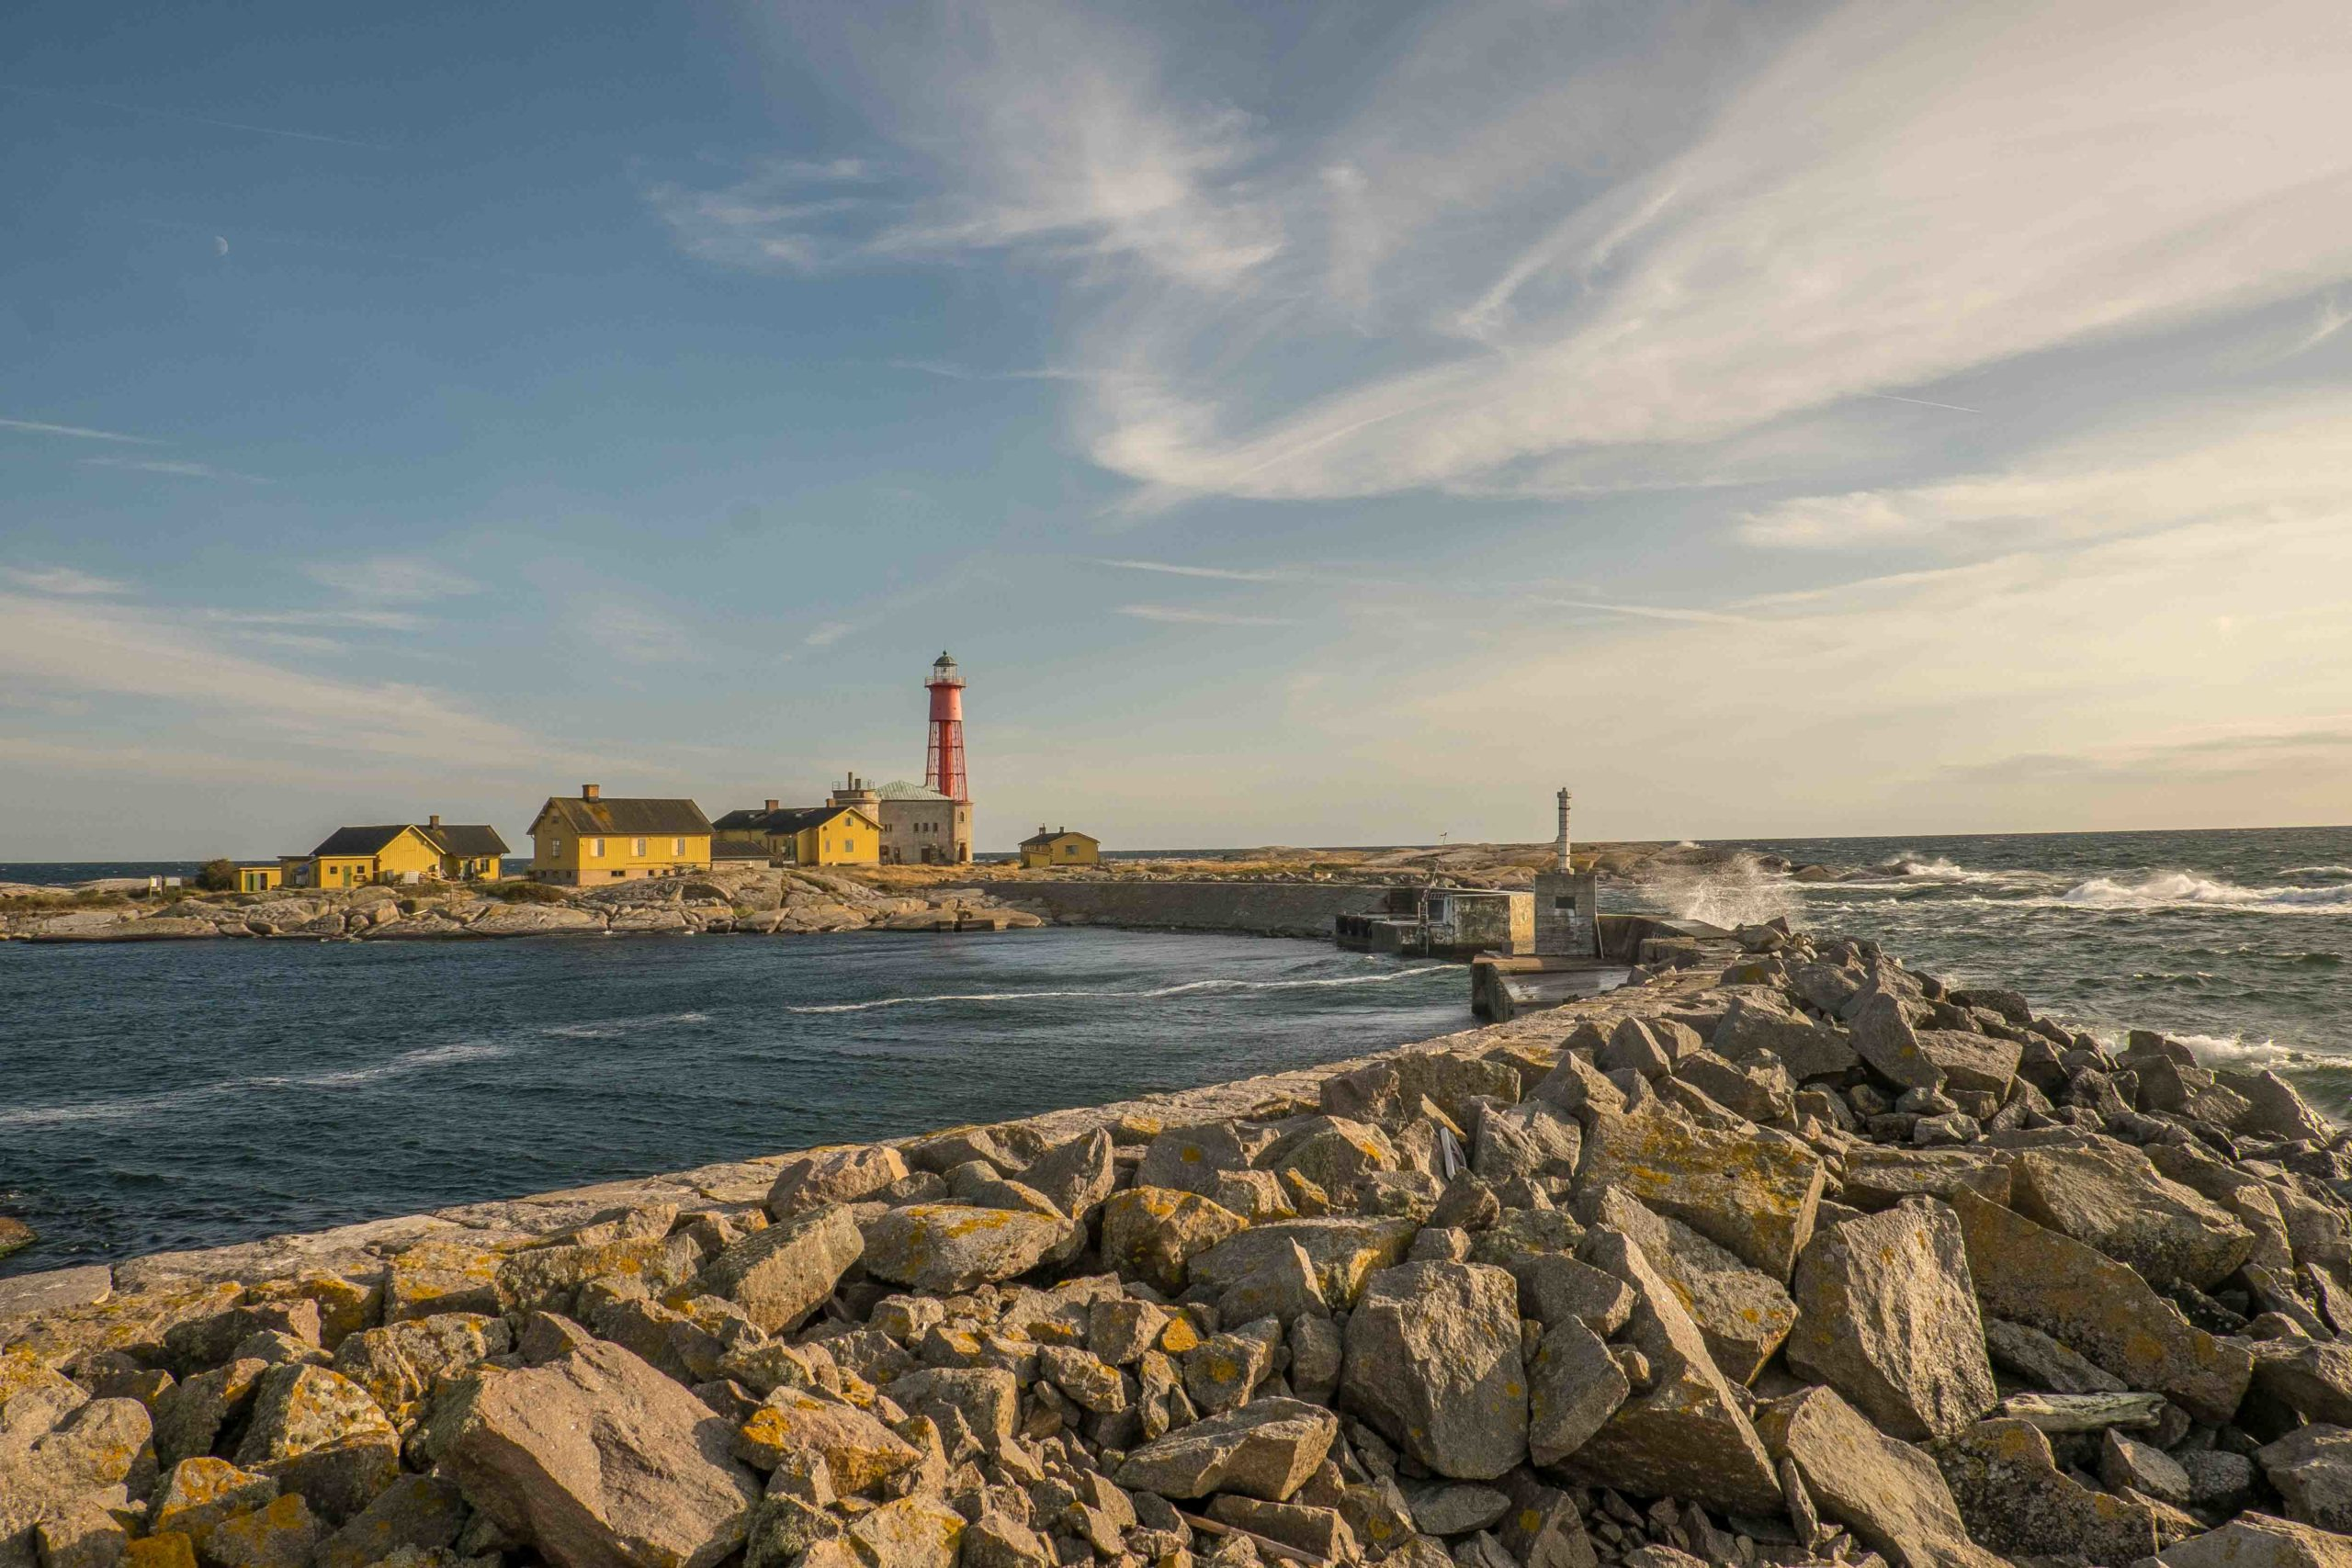 Utklippan: Wellenbrecher an der Hafeneinfahrt